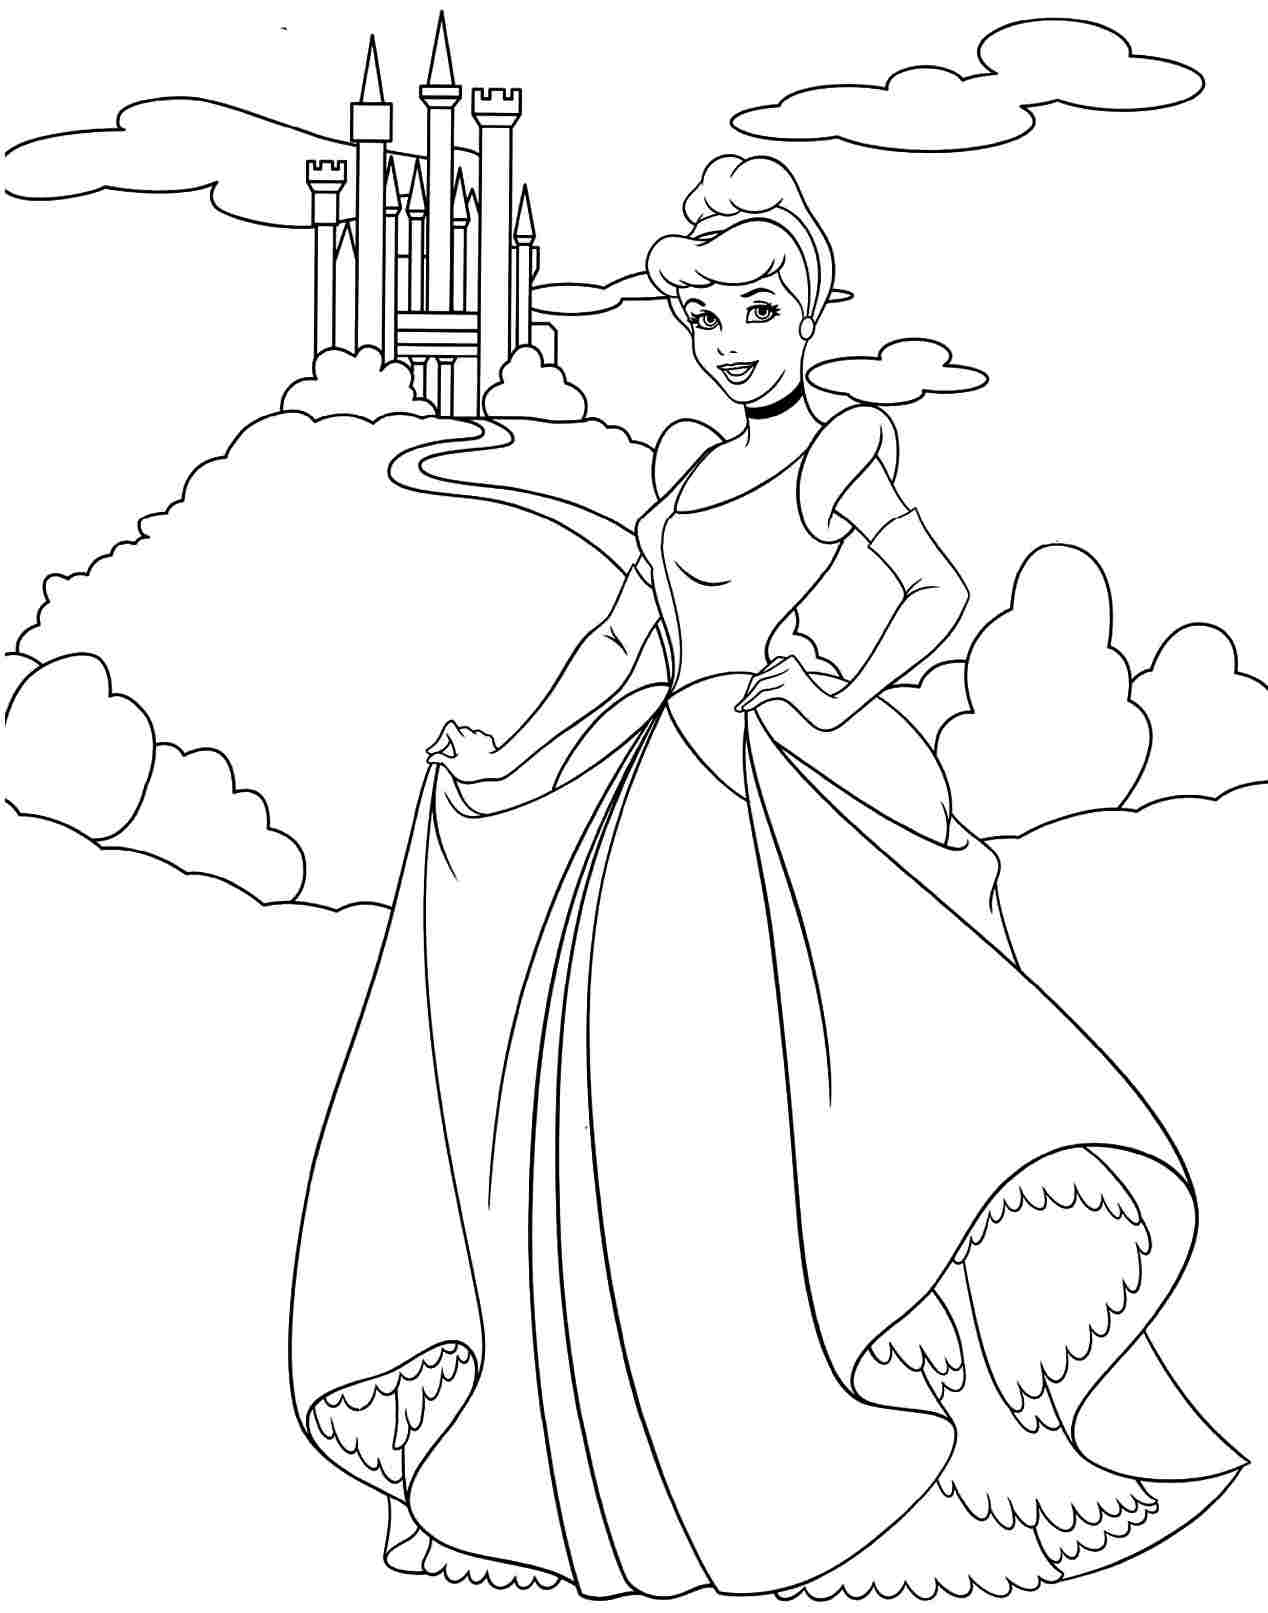 1268x1613 Pretty Princess Ready To Cestle With New Dress In Disney